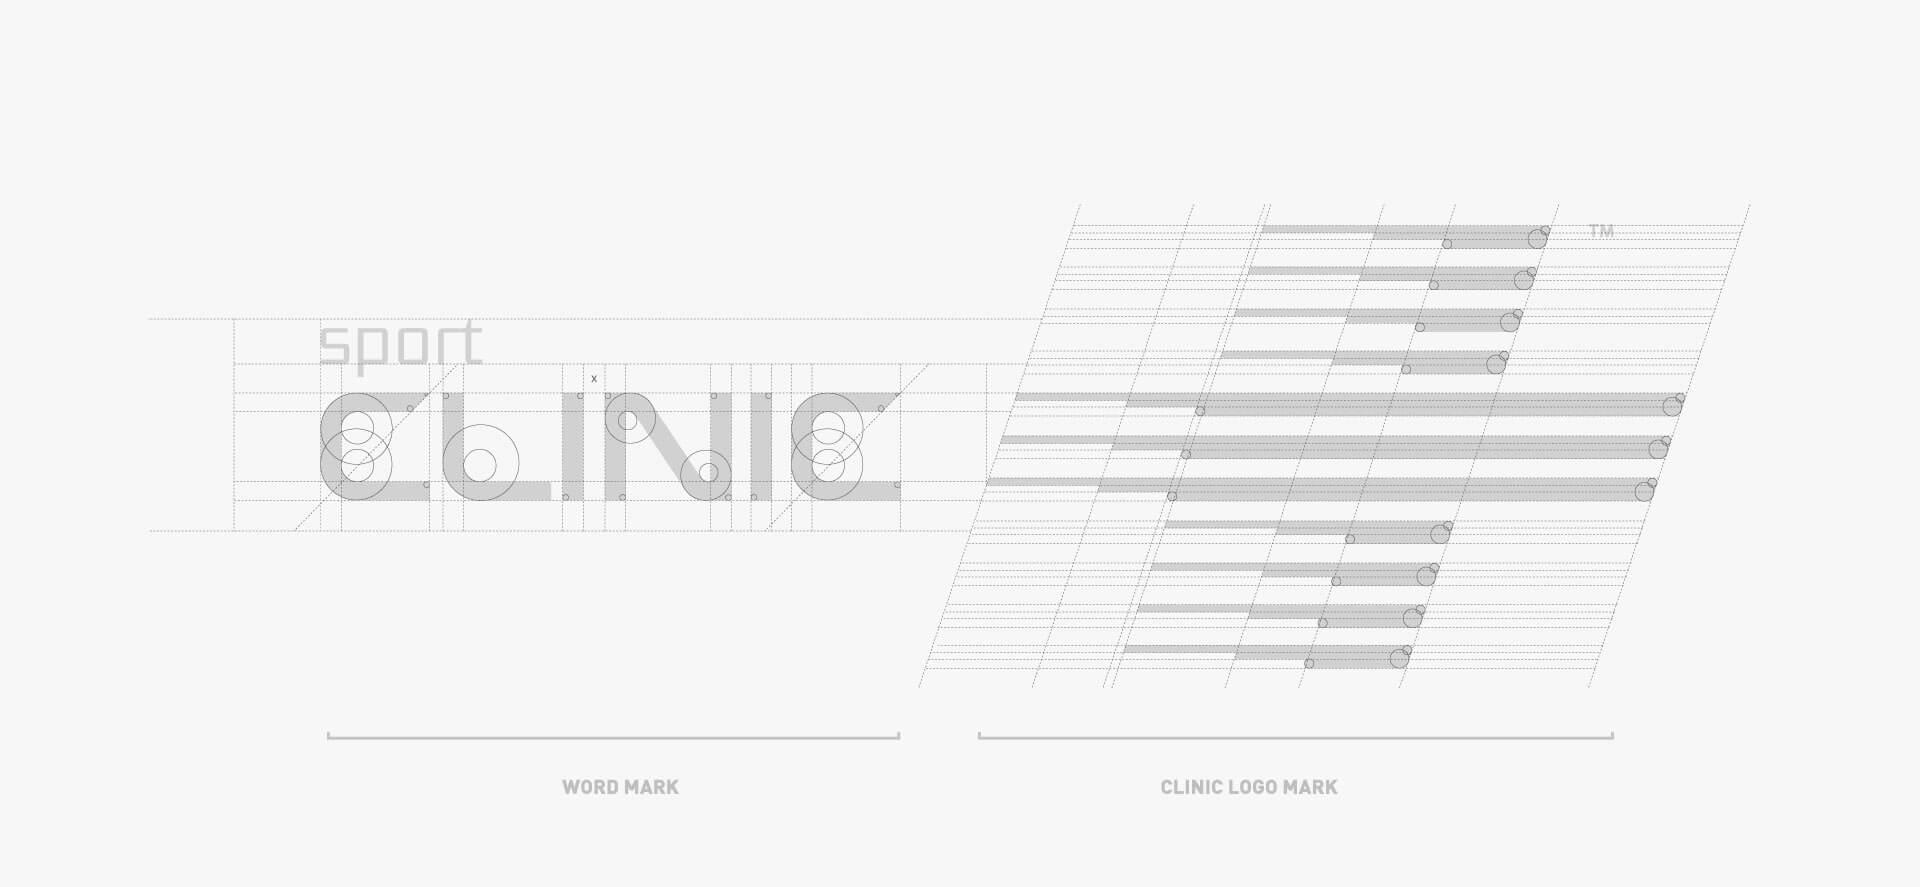 Clinic_layout_09e_name